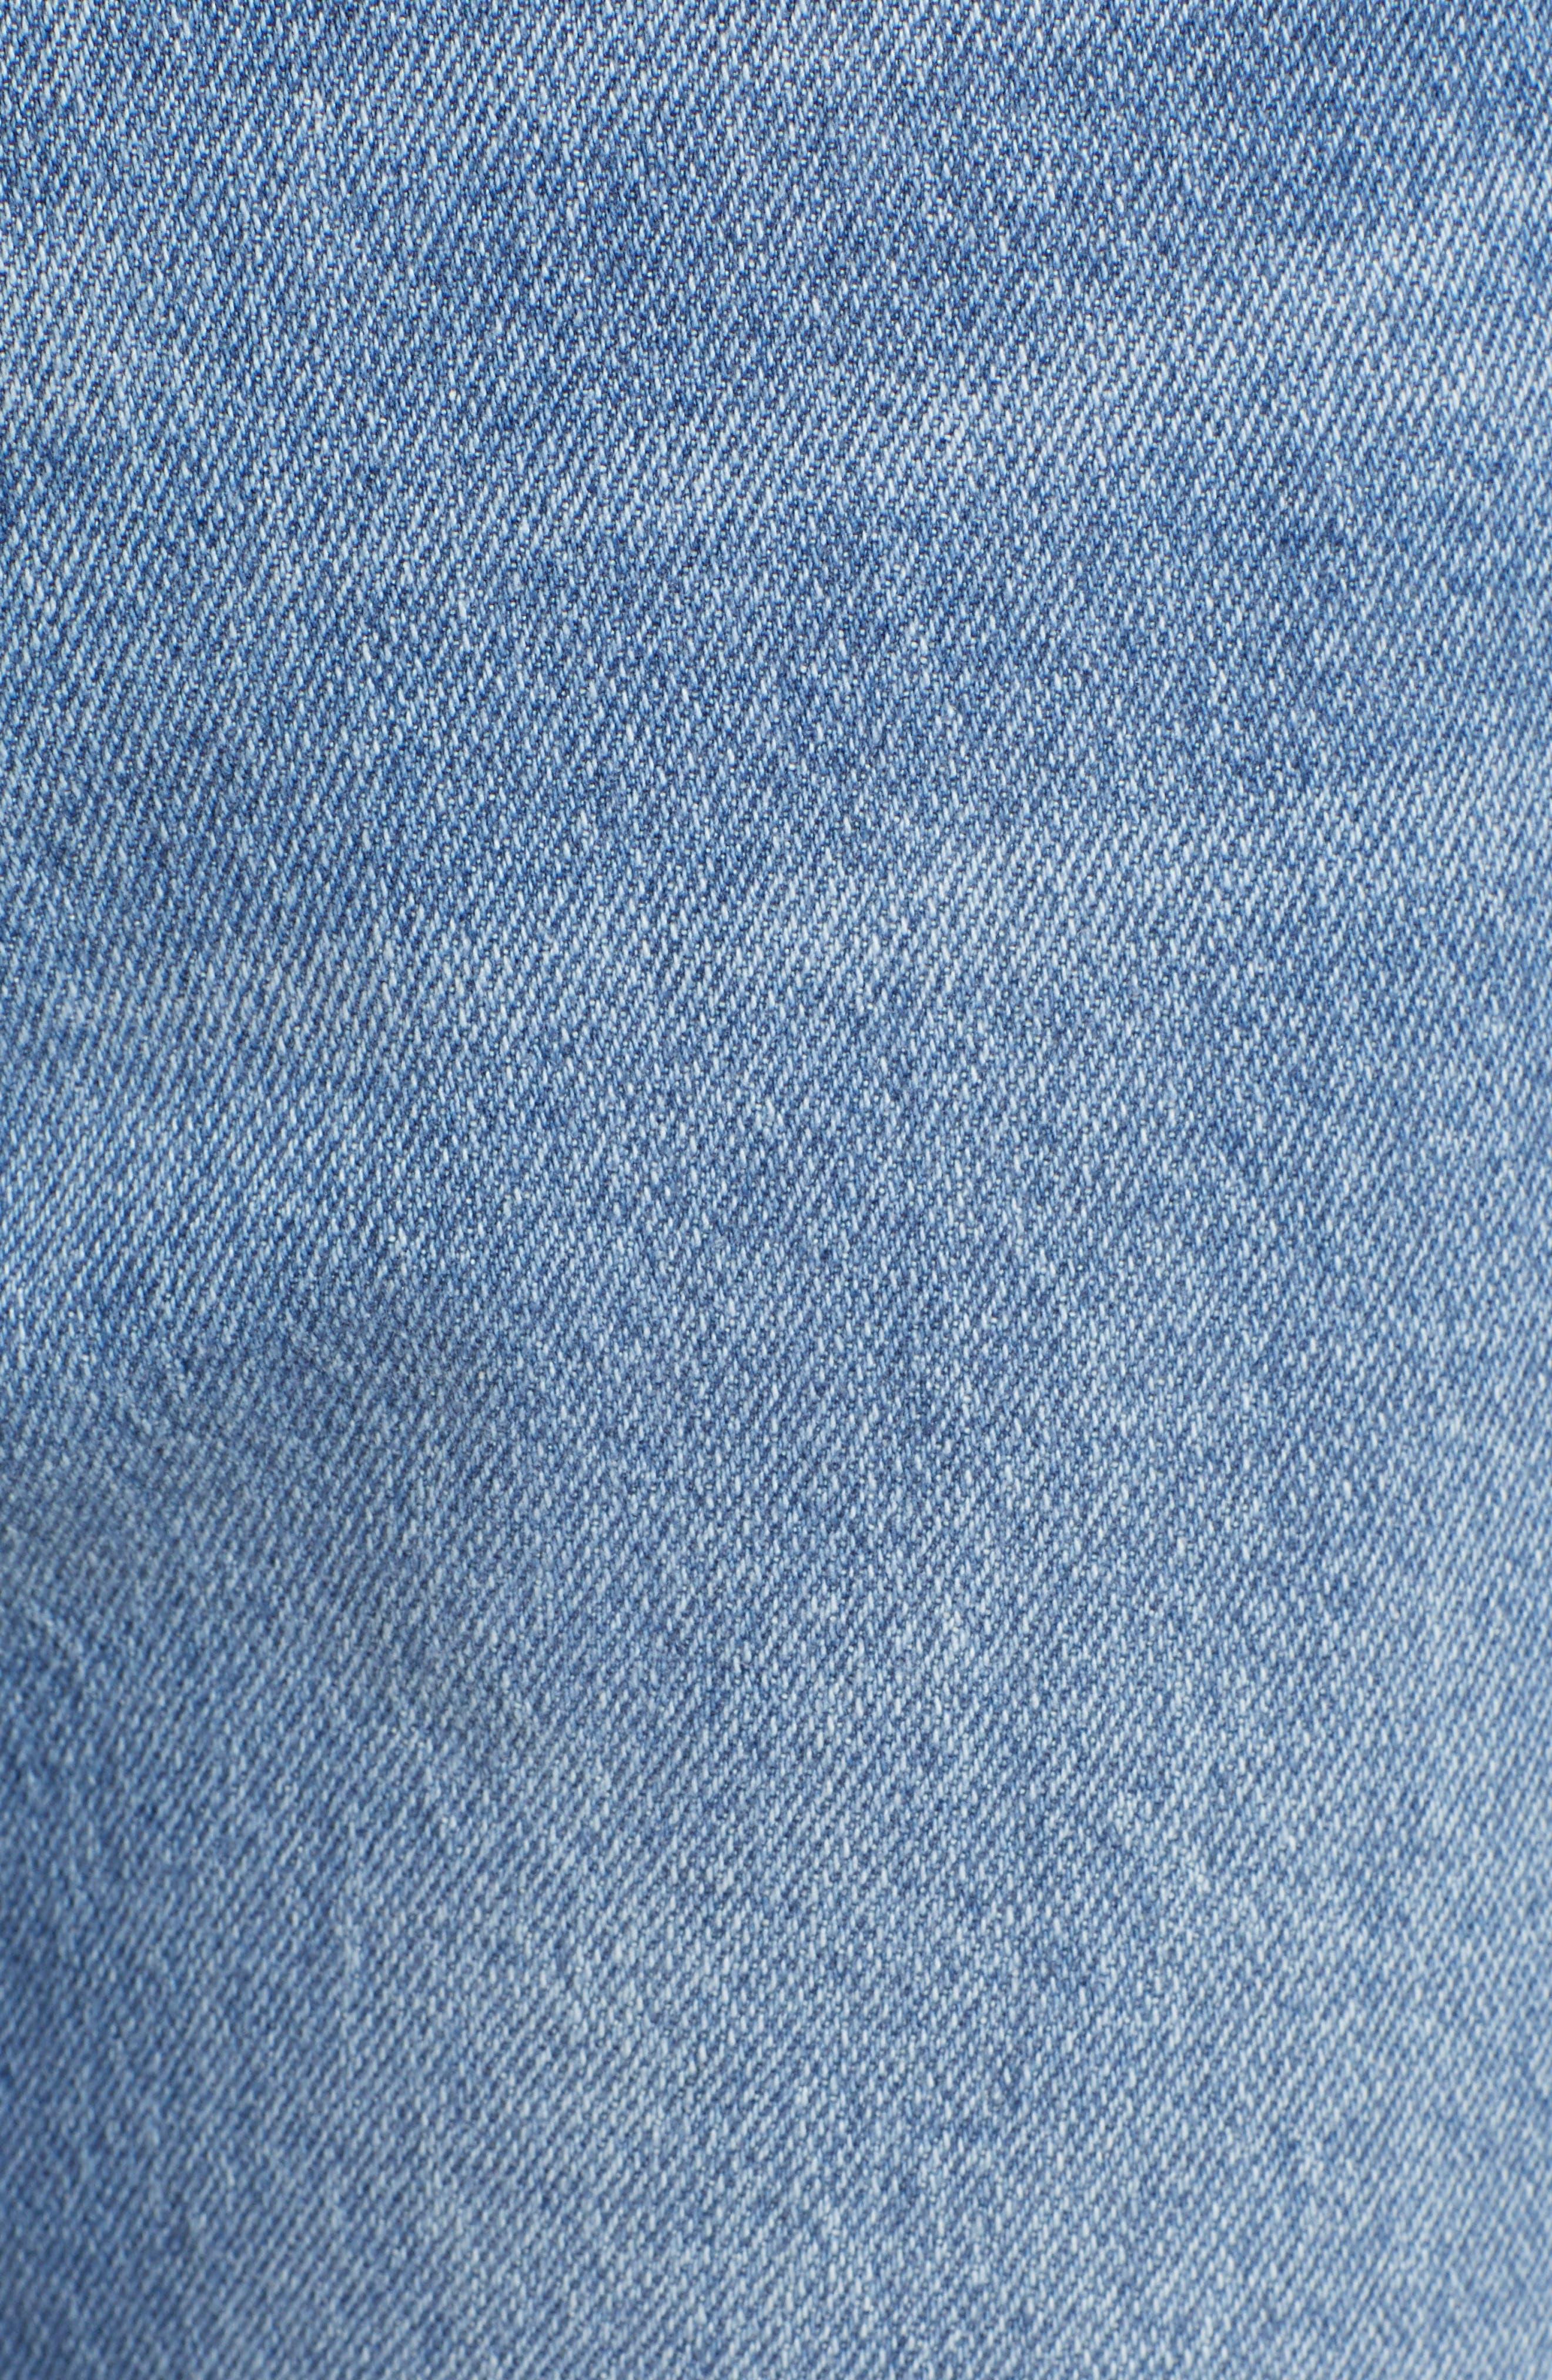 PROSPERITY DENIM, Ripped Crop Flare Jeans, Alternate thumbnail 6, color, MEDIUM WASH